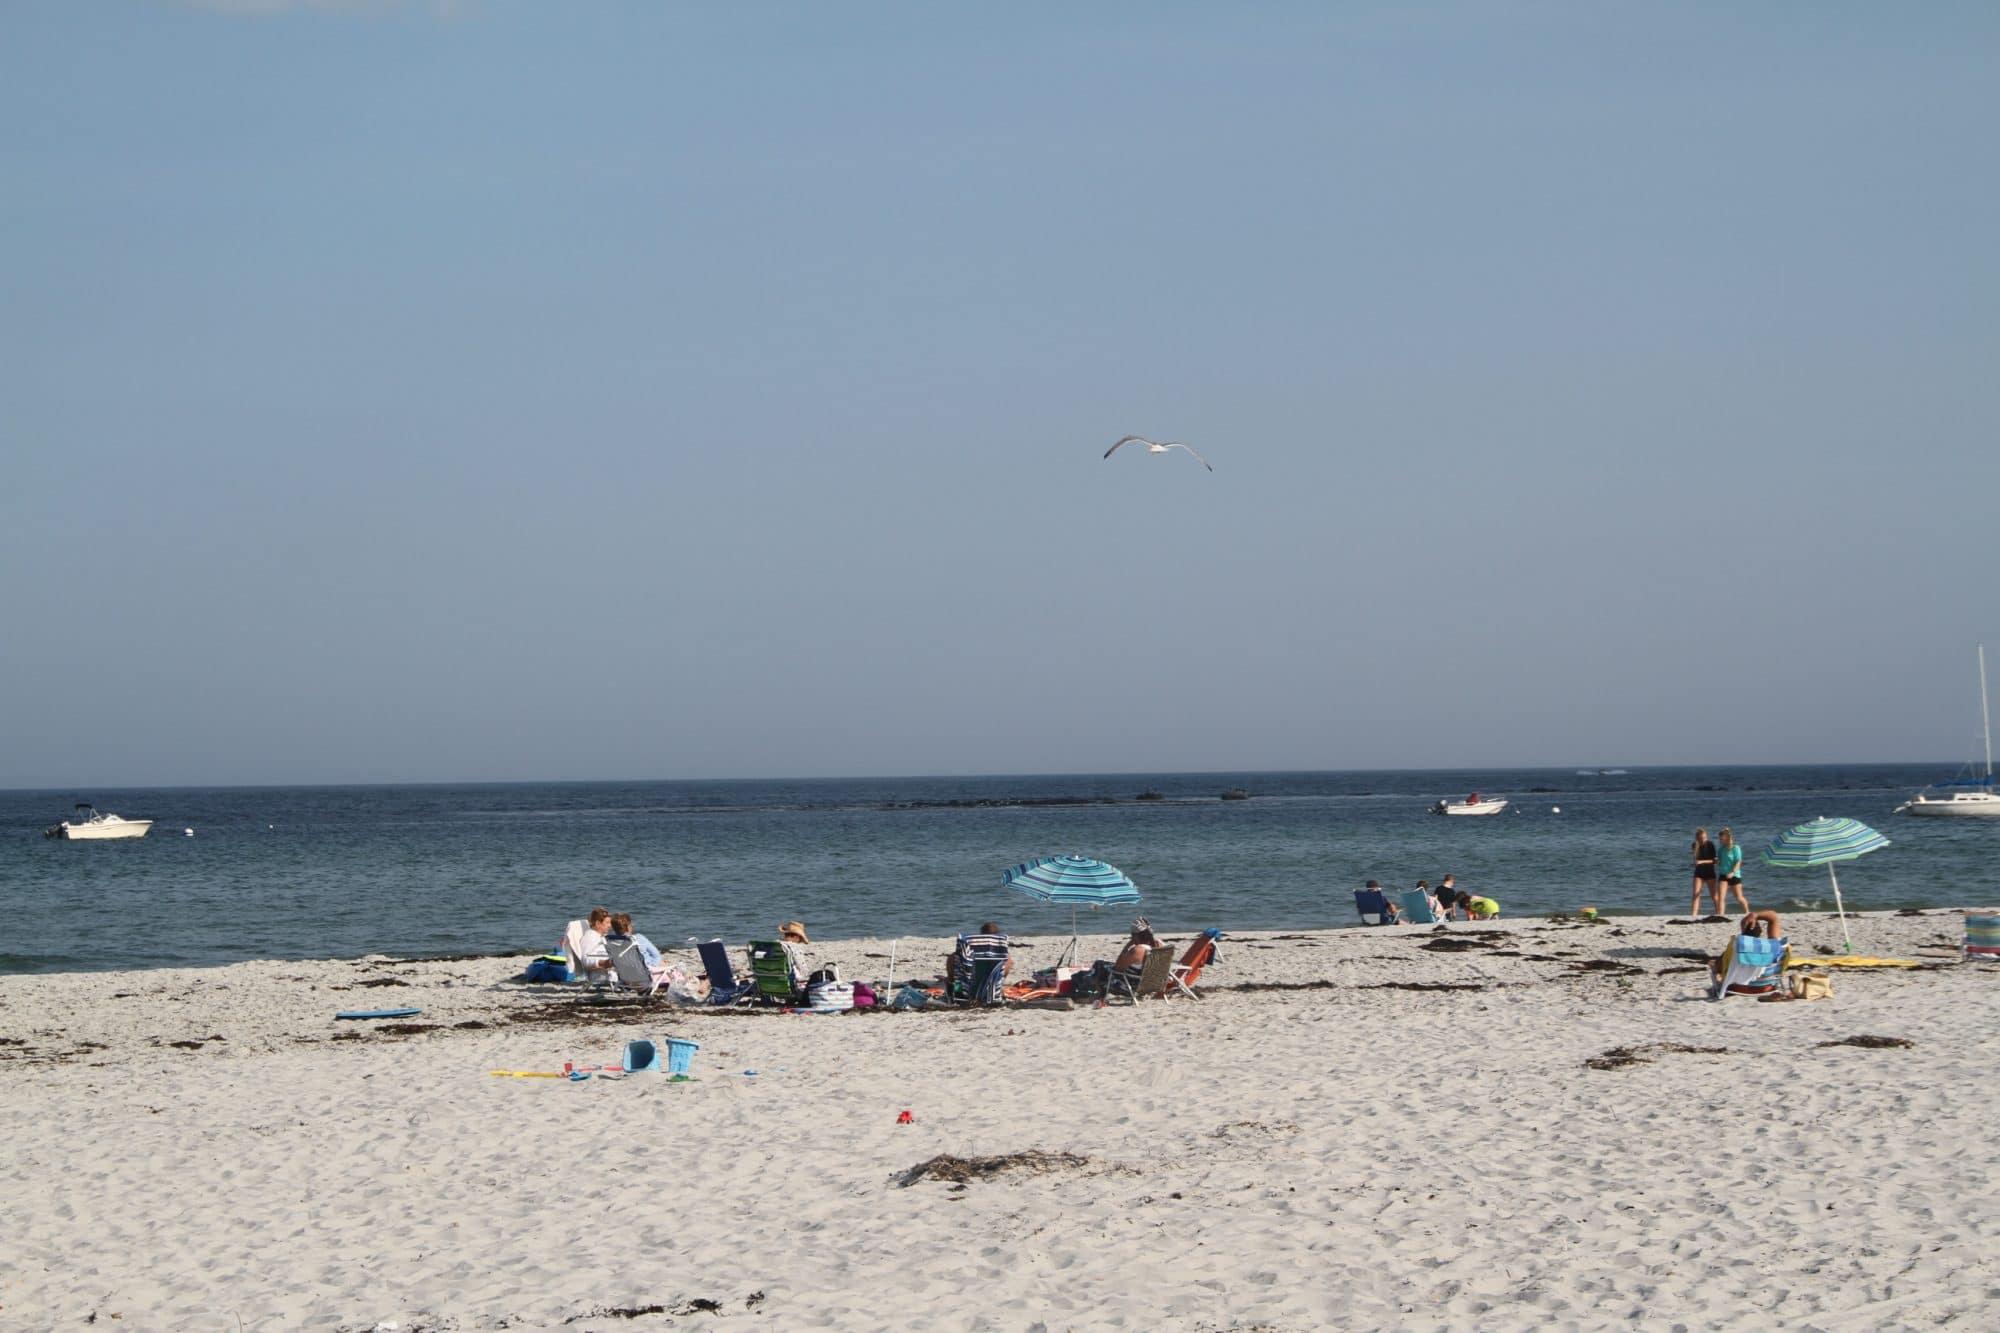 goose-rocks-beach-umbrellas-blue